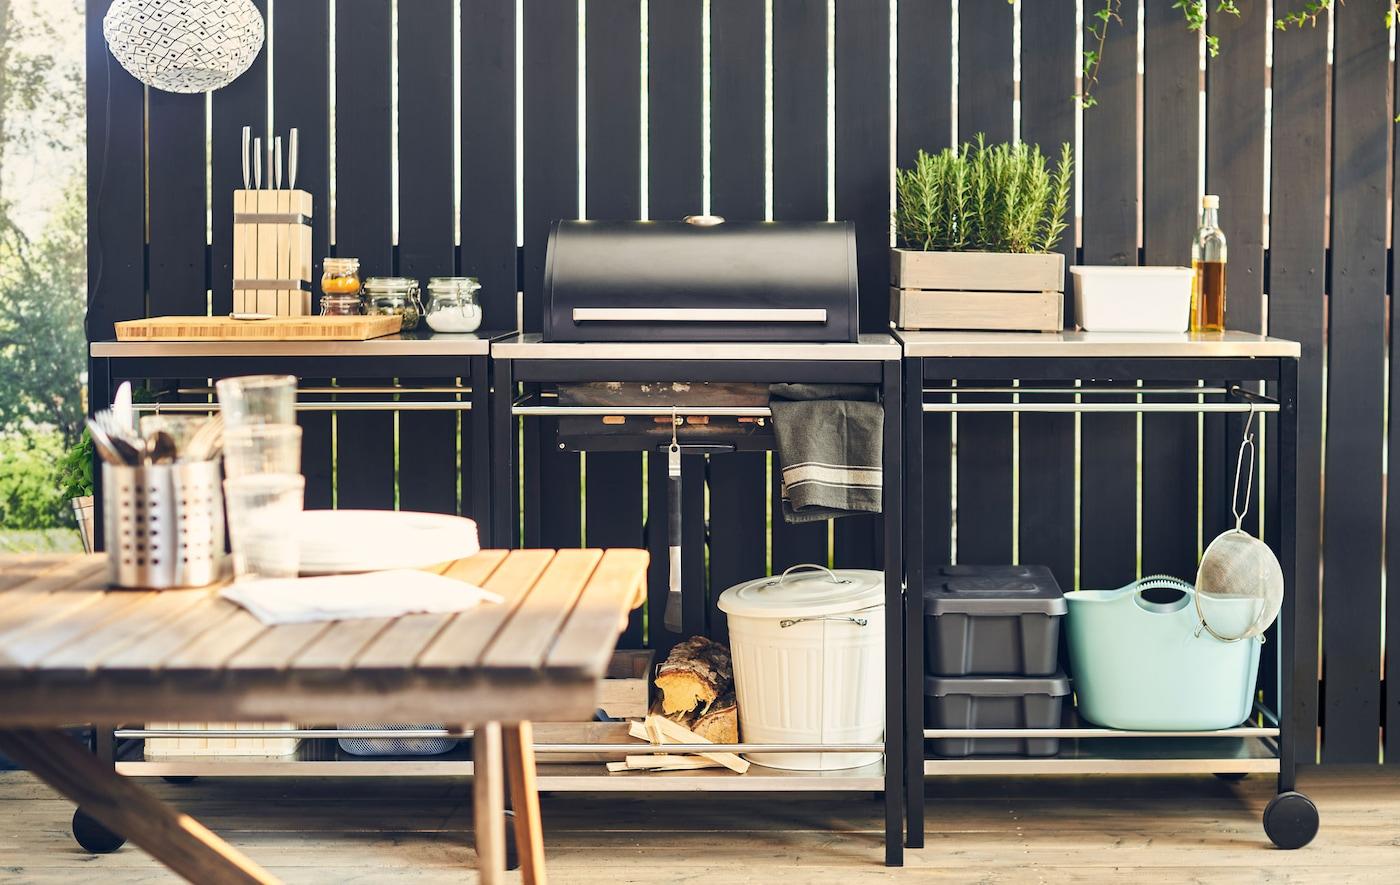 outdoor k che planen ikea. Black Bedroom Furniture Sets. Home Design Ideas